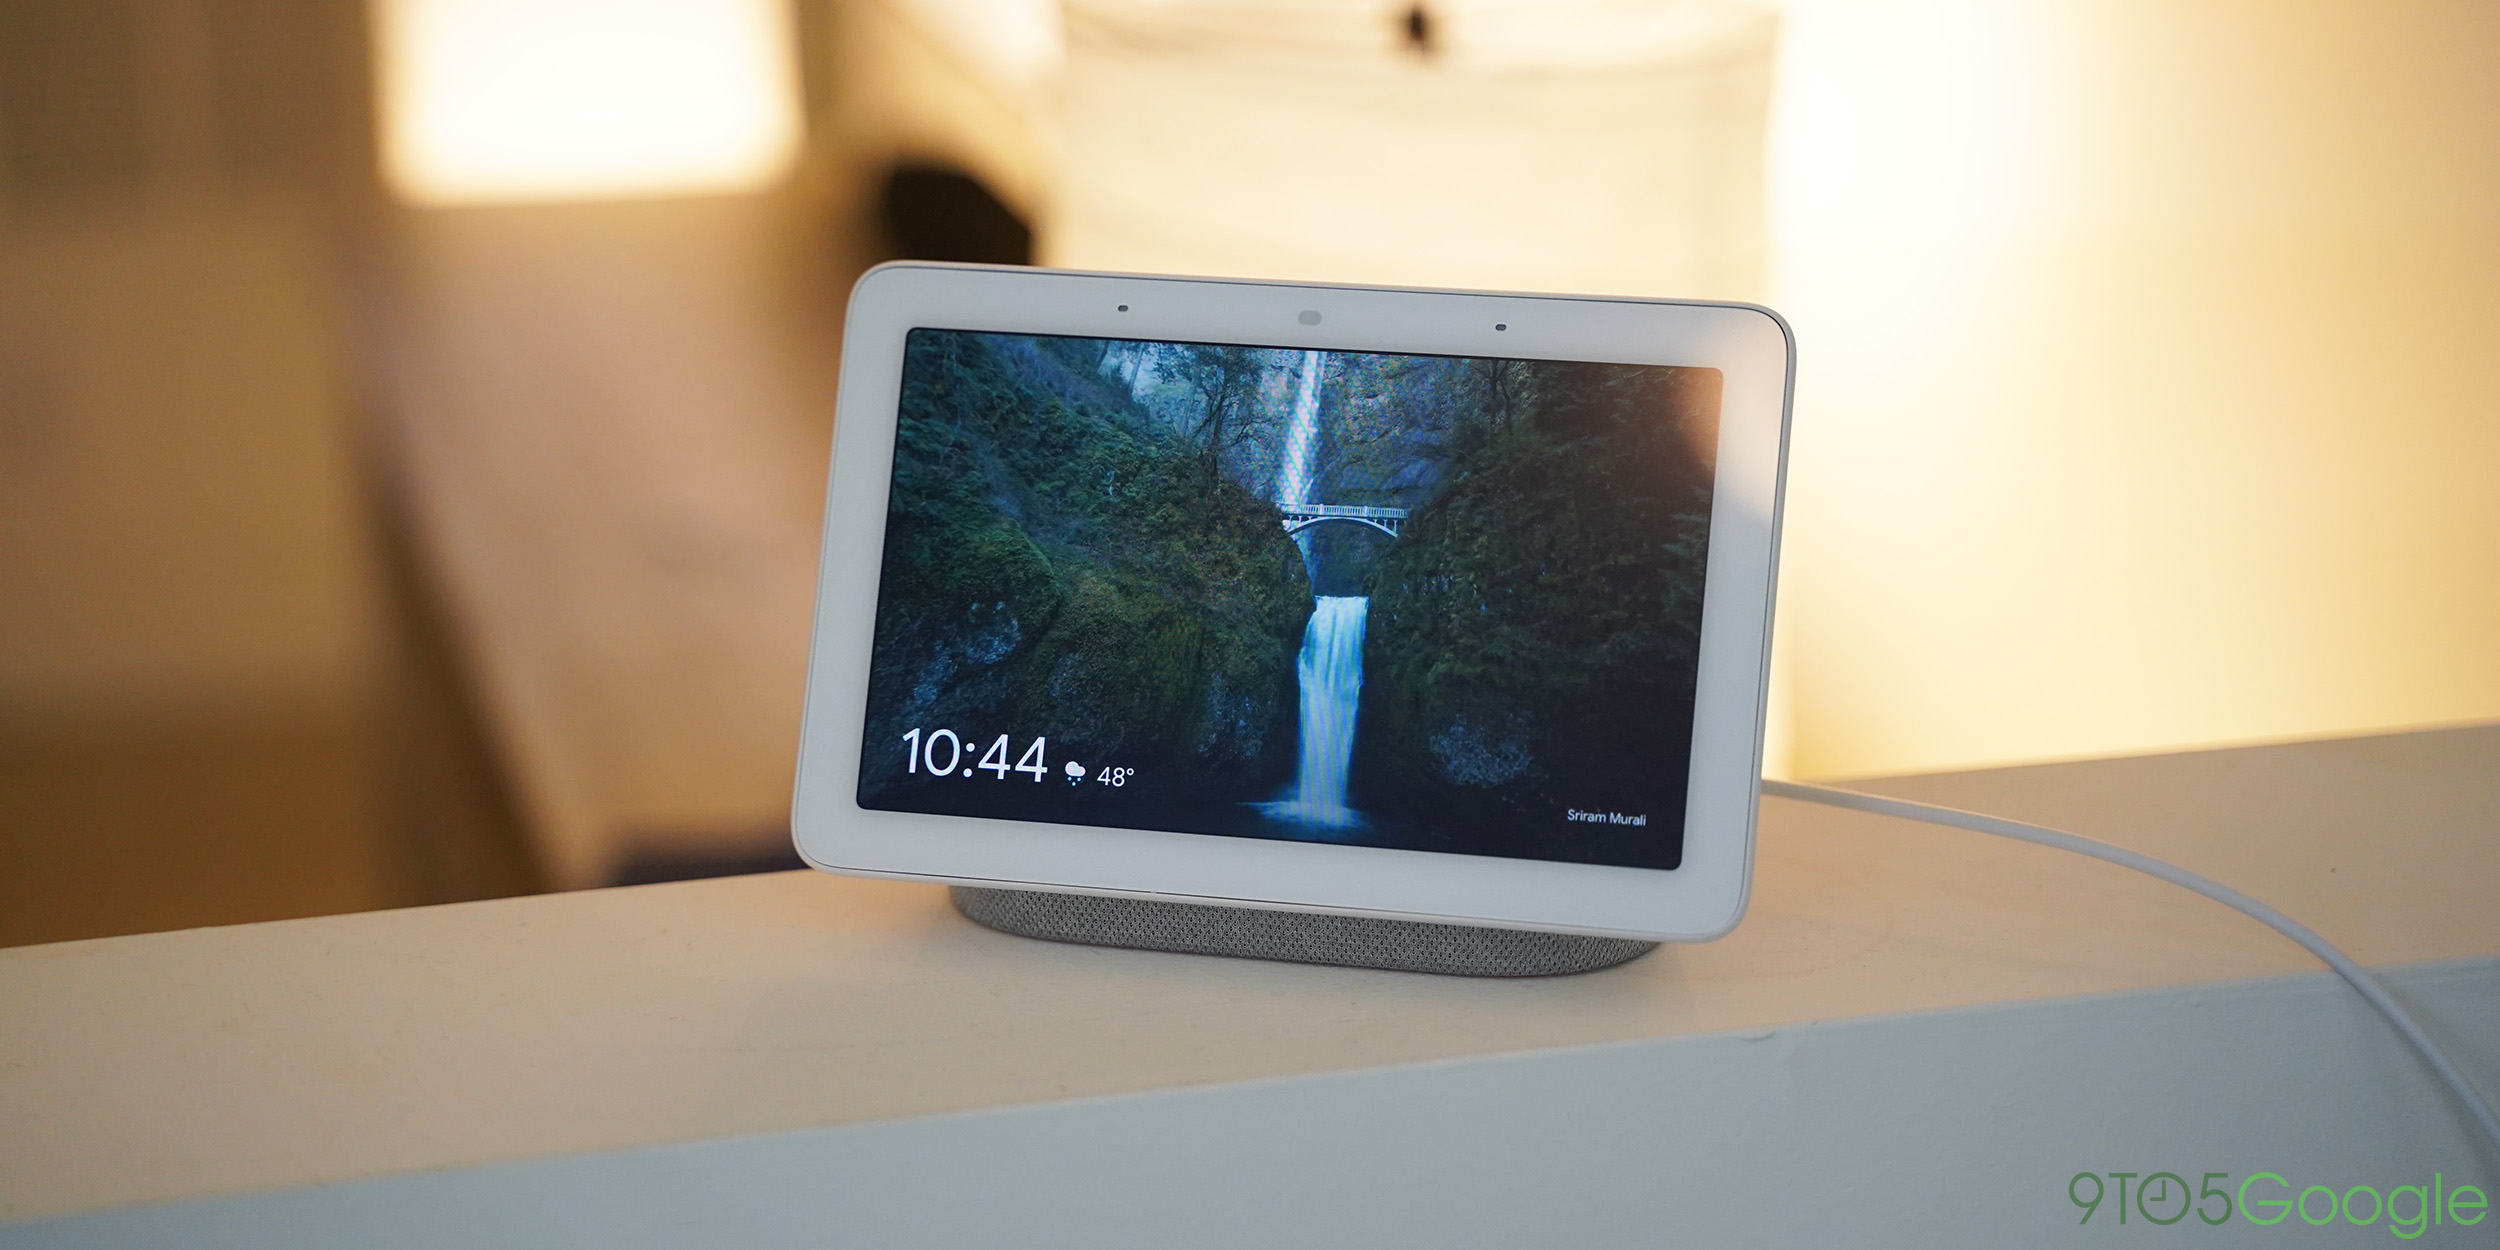 9to5Toys Letzter Aufruf: Google Home Hub 85, Logitech Amazon Gold Box, SanDisk 64 GB Flash Drive 10, mehr